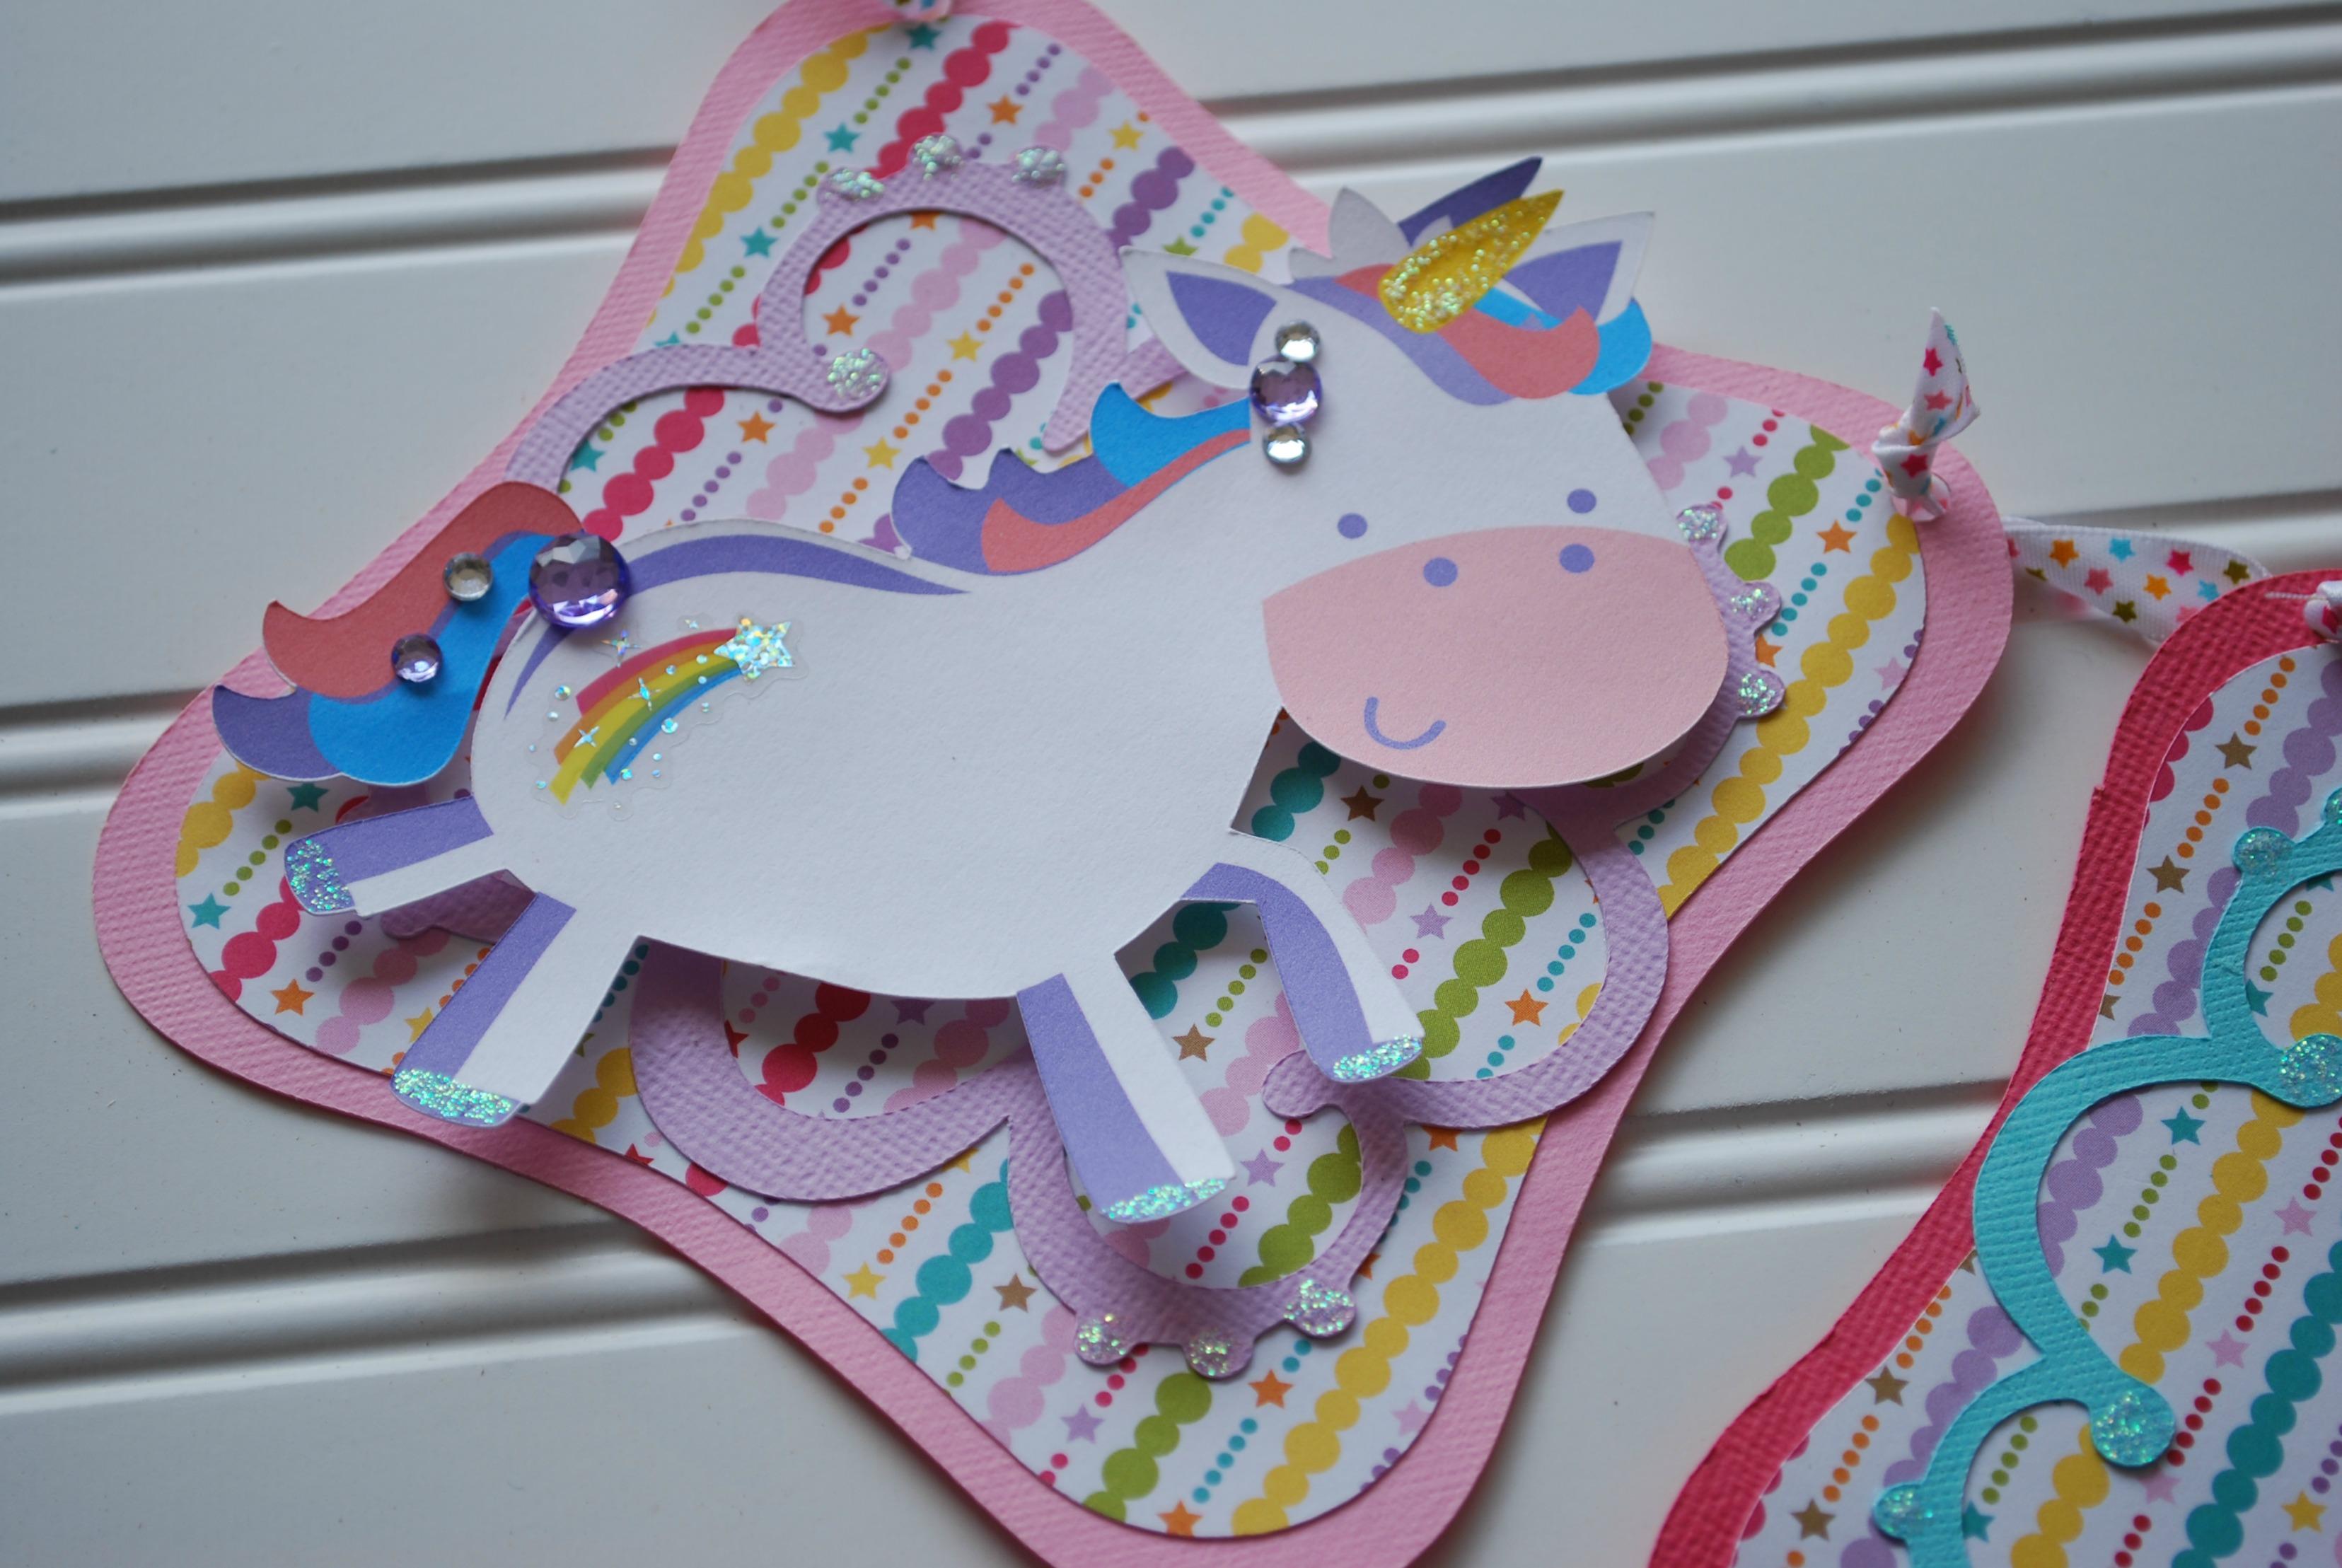 Little Girls Are Made Of Rainbow & Unicorn Magic A Piece